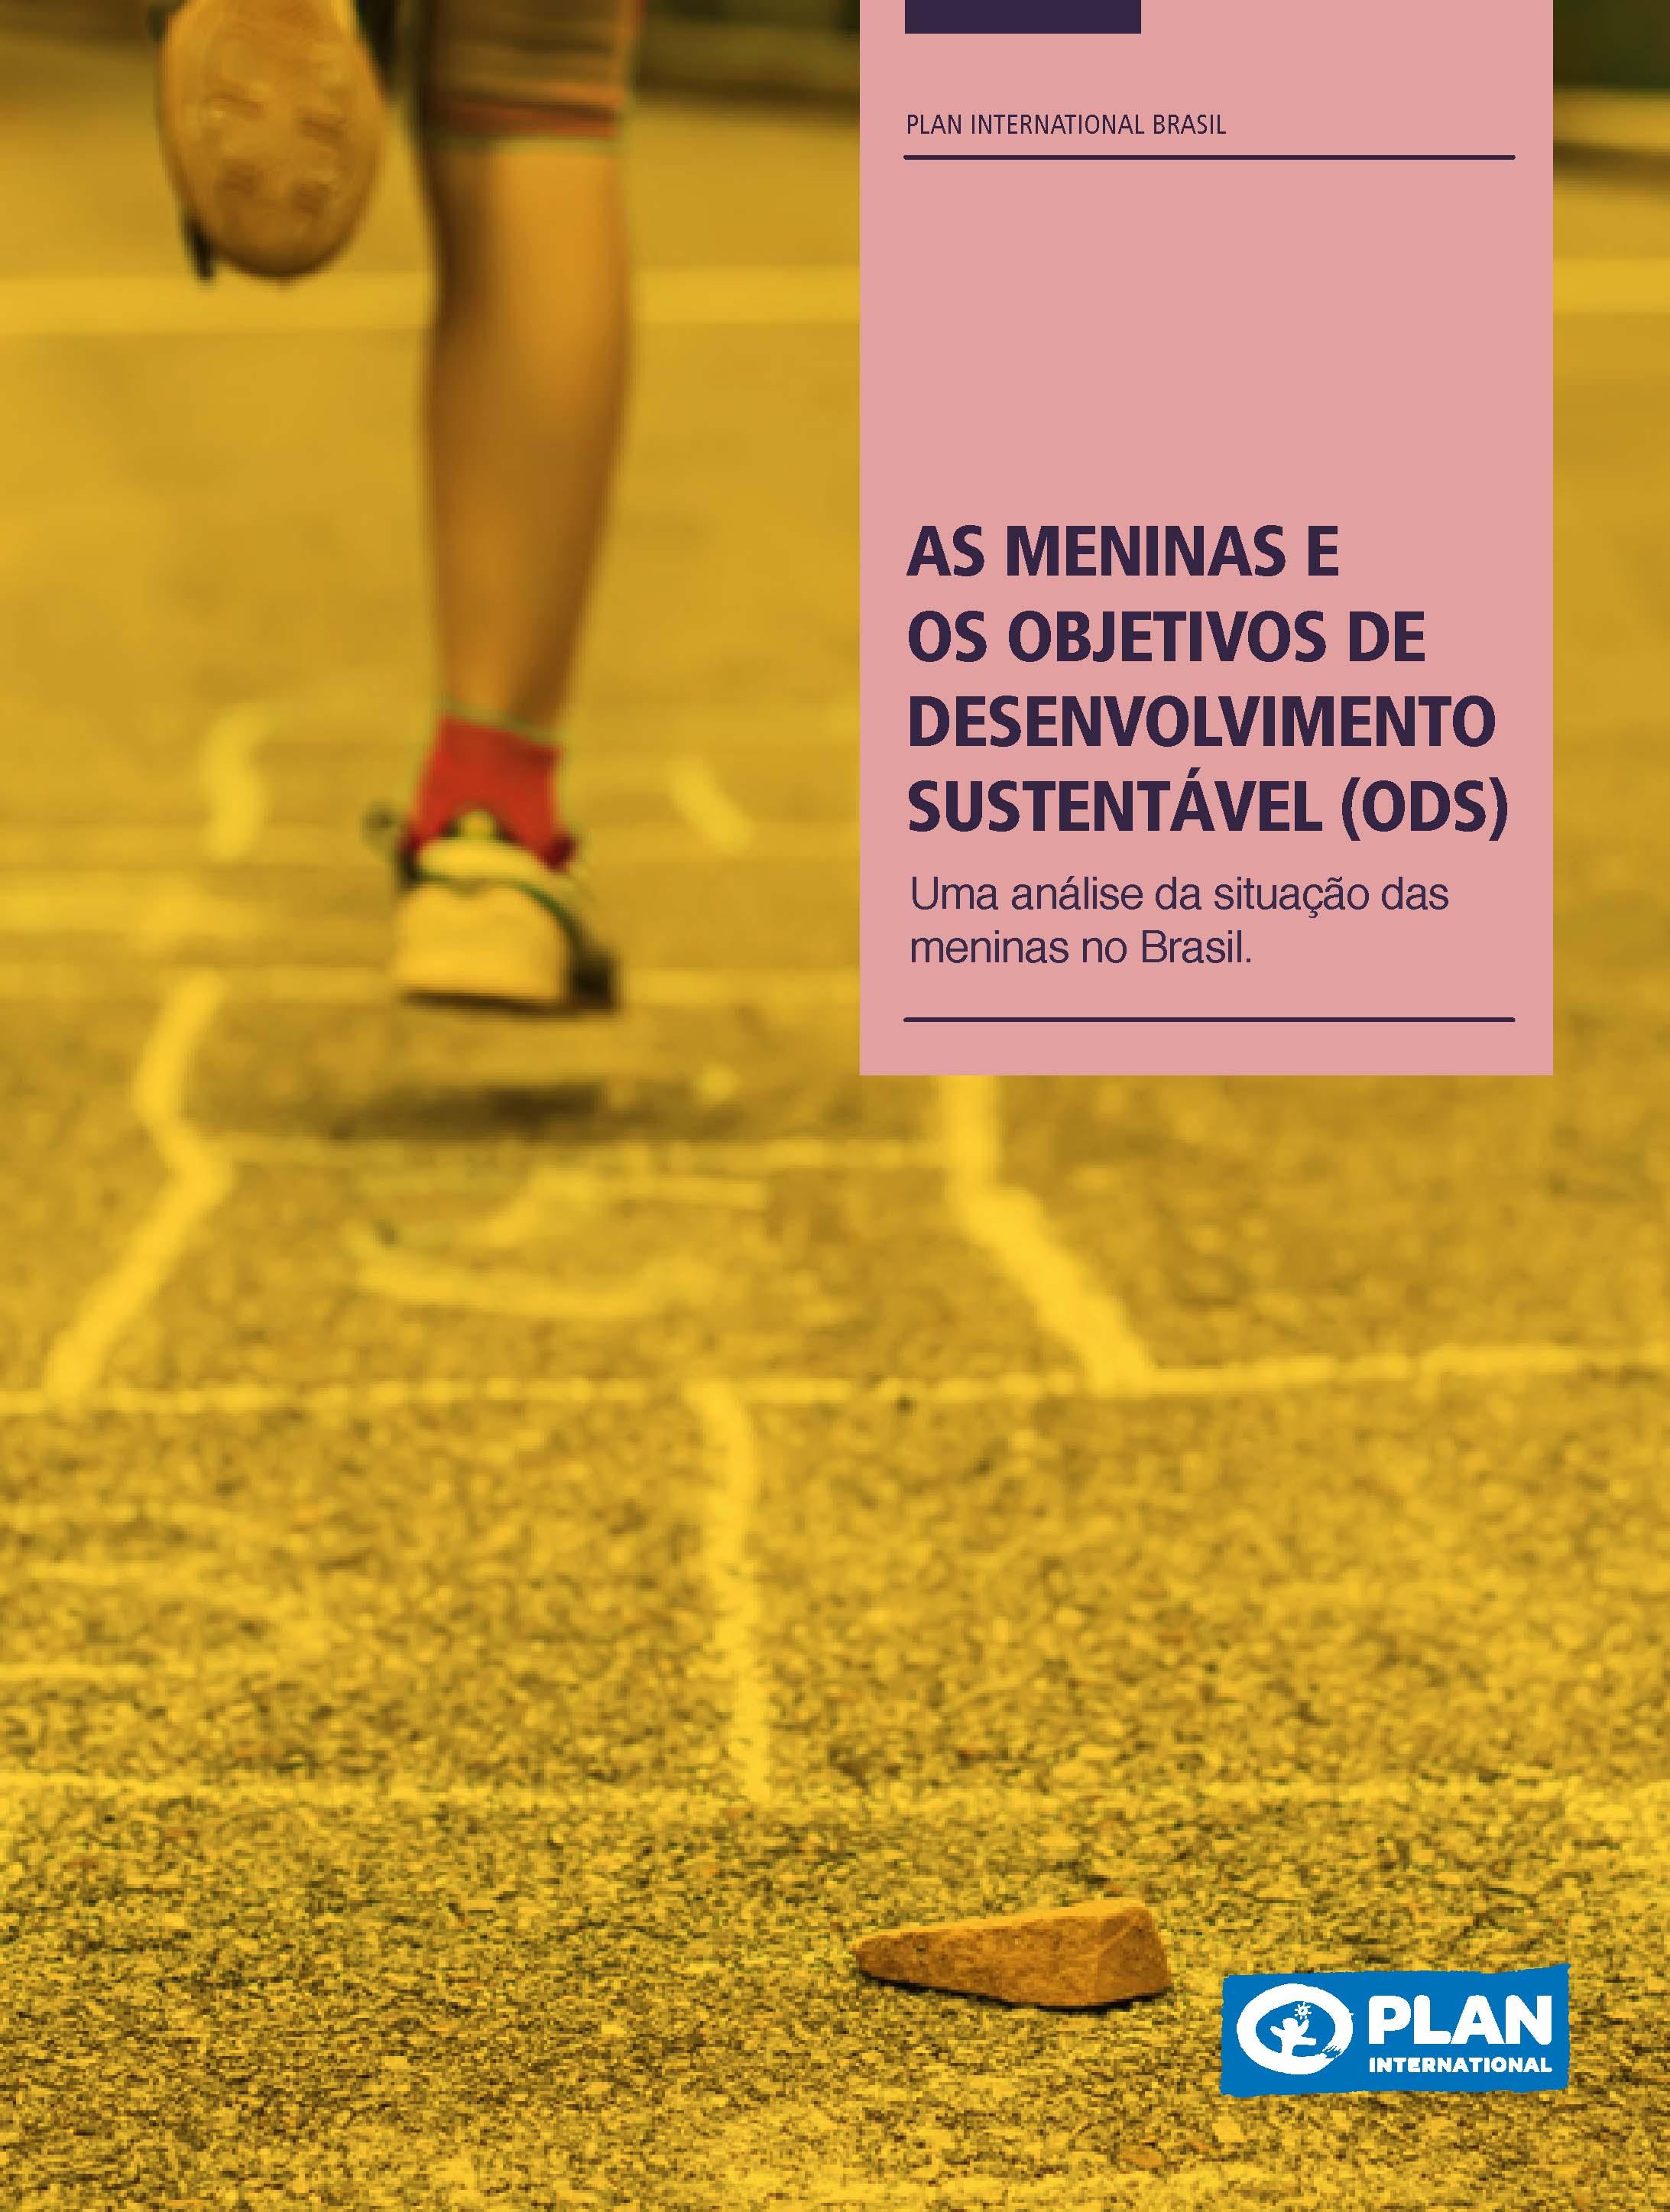 relatório-meninas-ods-plan-international-brasil